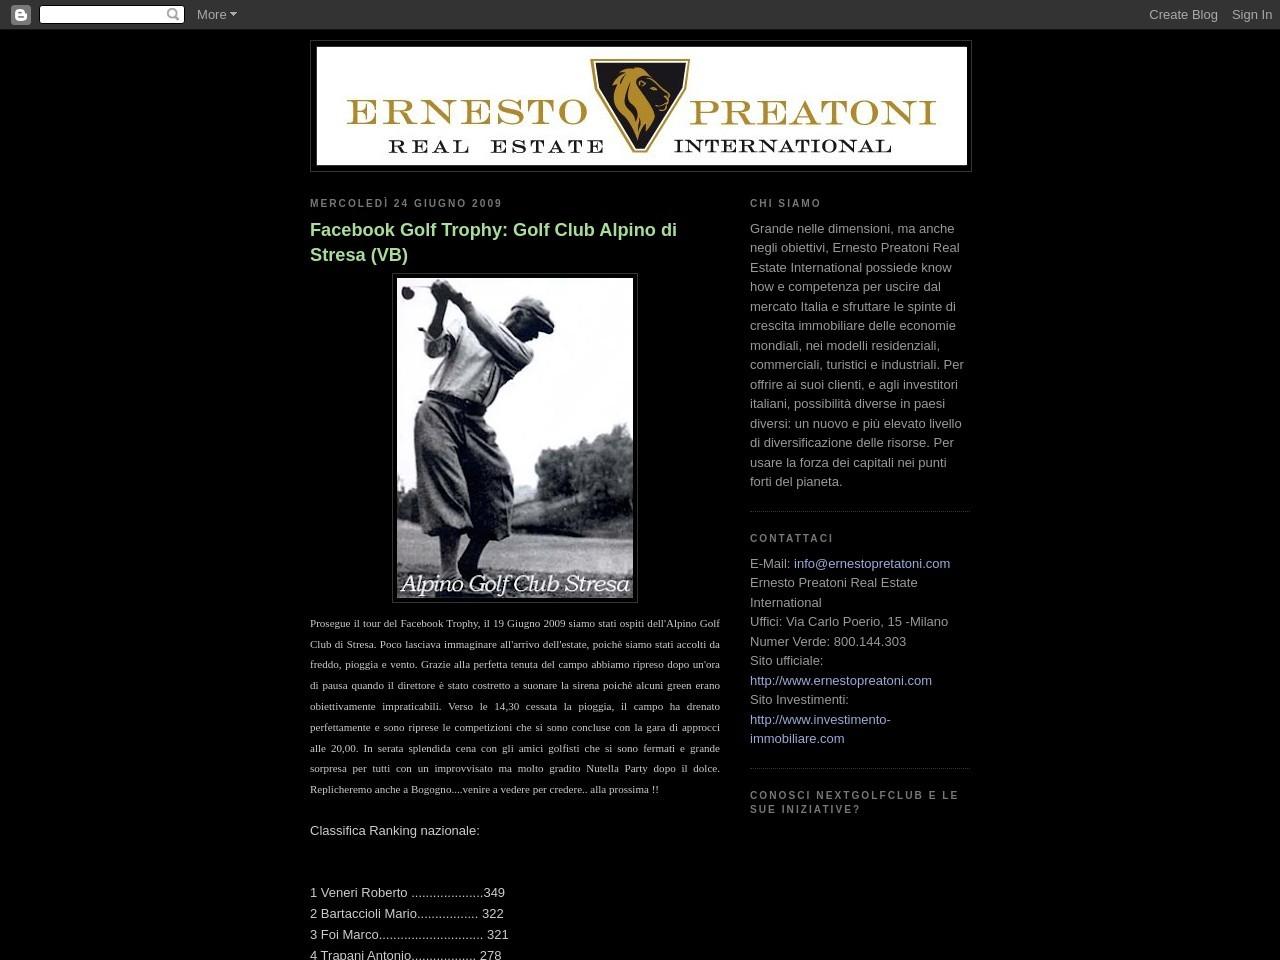 facebook-golf-trophy-09-sponsored-by-ernesto-preatoni-real-estate